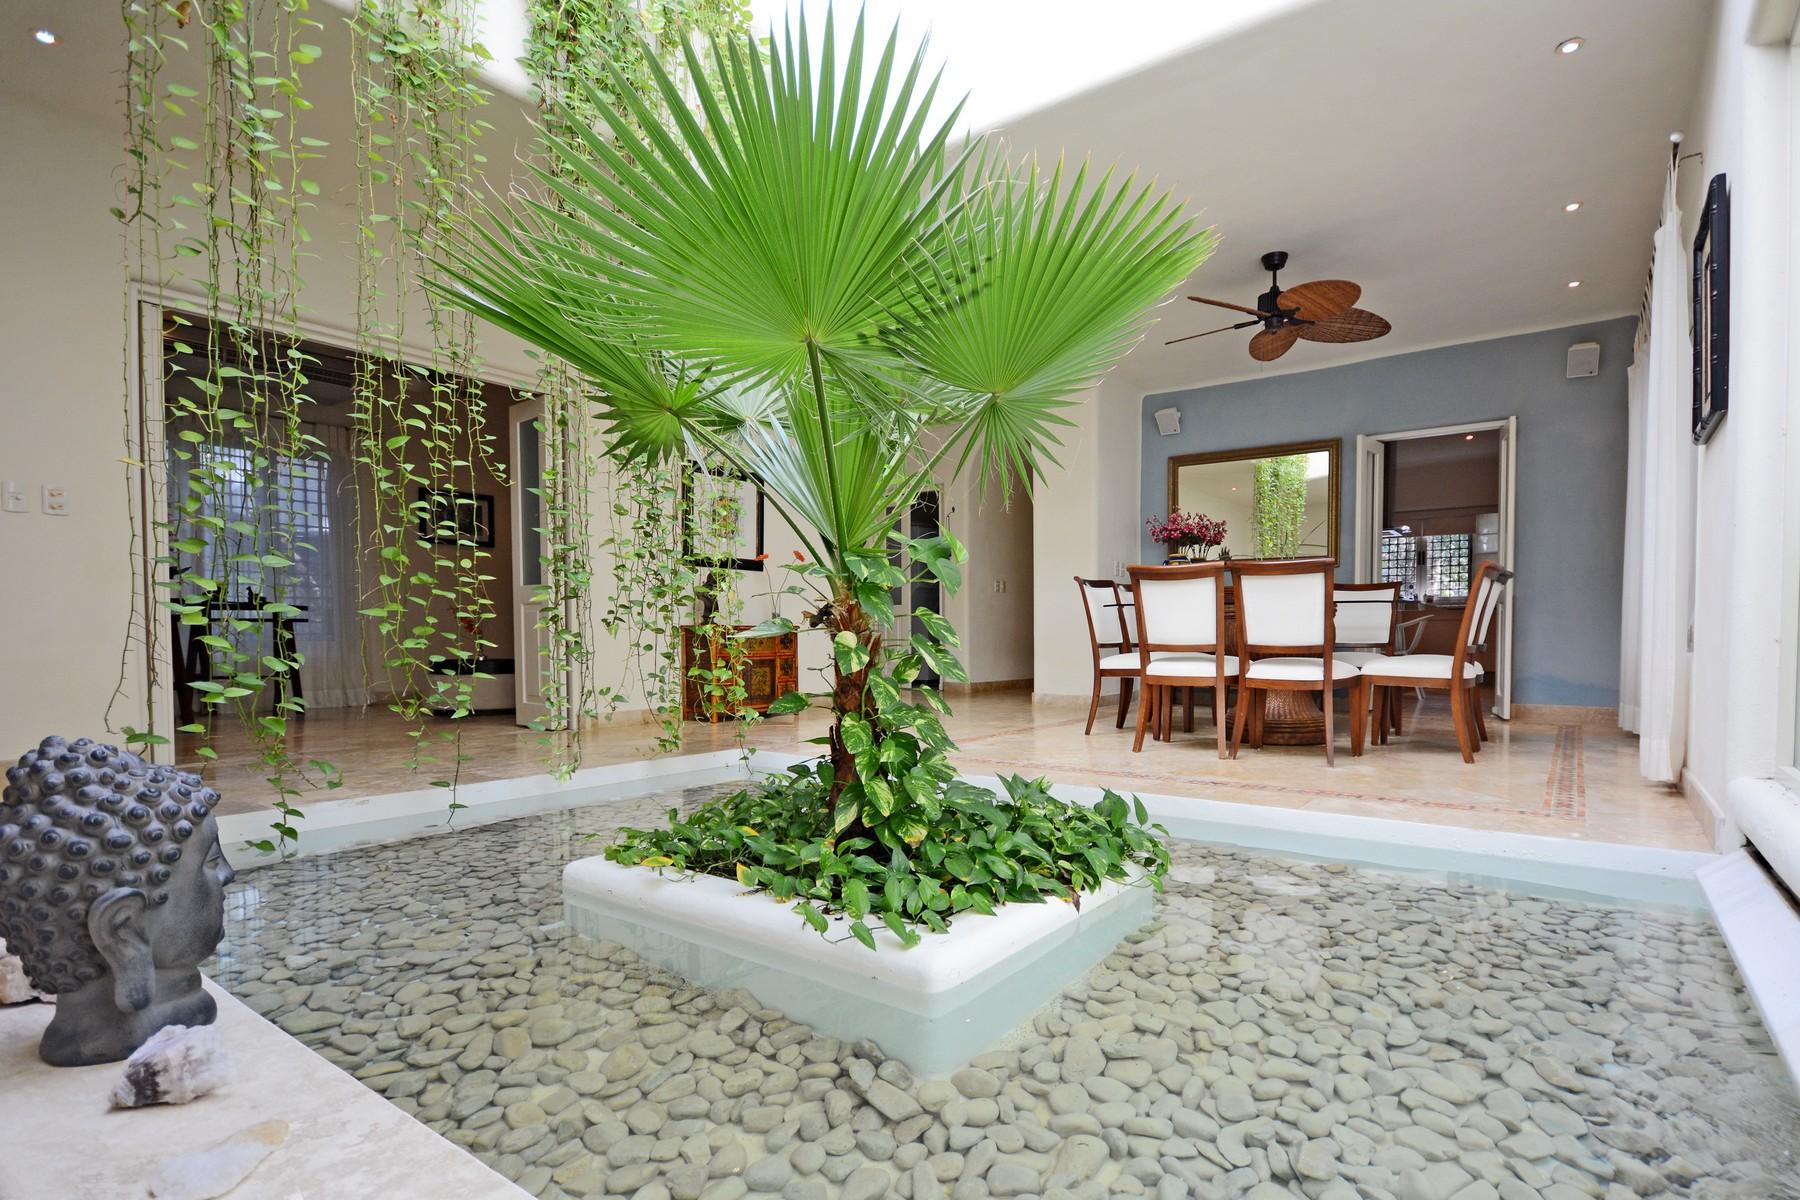 Additional photo for property listing at SERENITY HOME Retorno Copán Condominio Club Real Mza 22, C 73 Playa Del Carmen, Quintana Roo 777 México